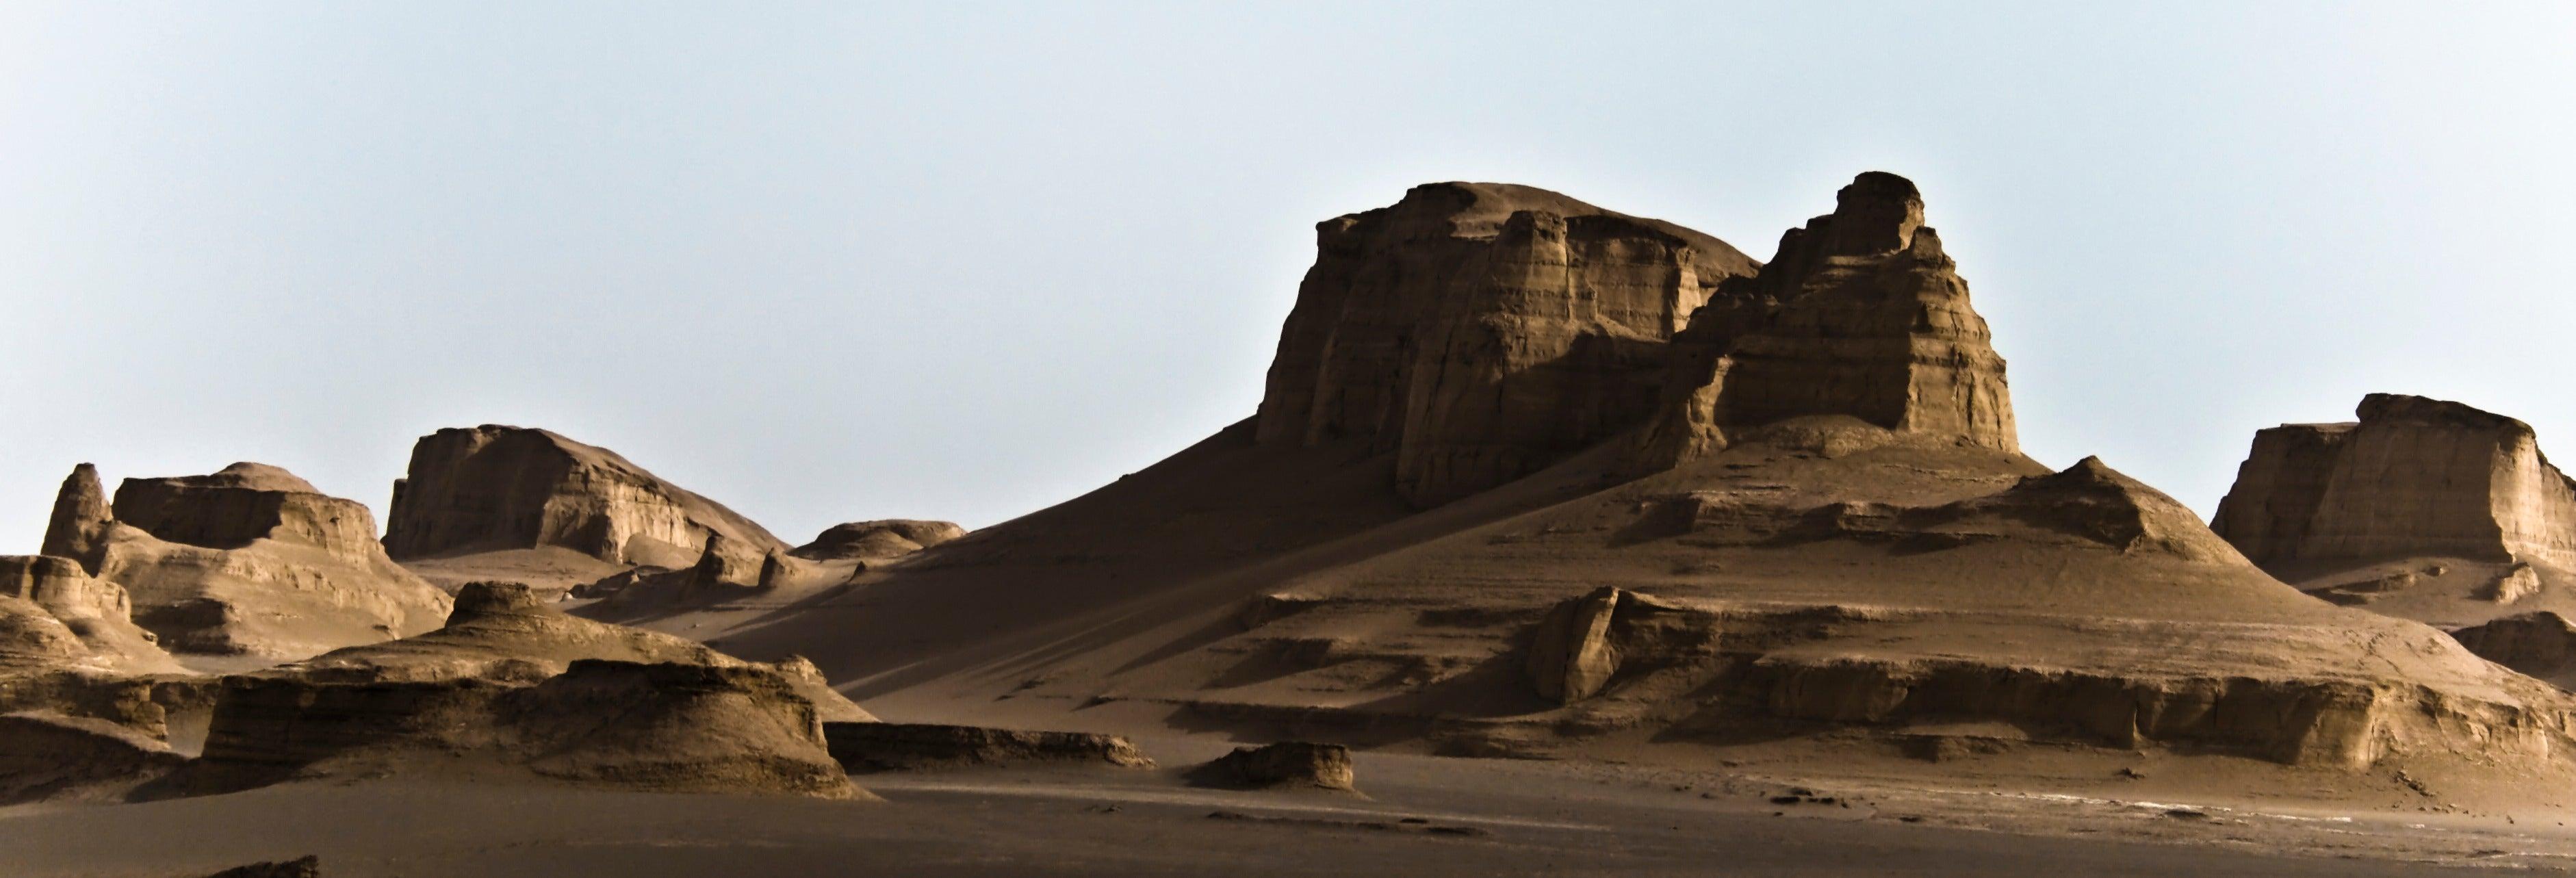 Elysium: Sombras em Nevriande (D&D 3.5) Desert-safari-kaluts-shahdad